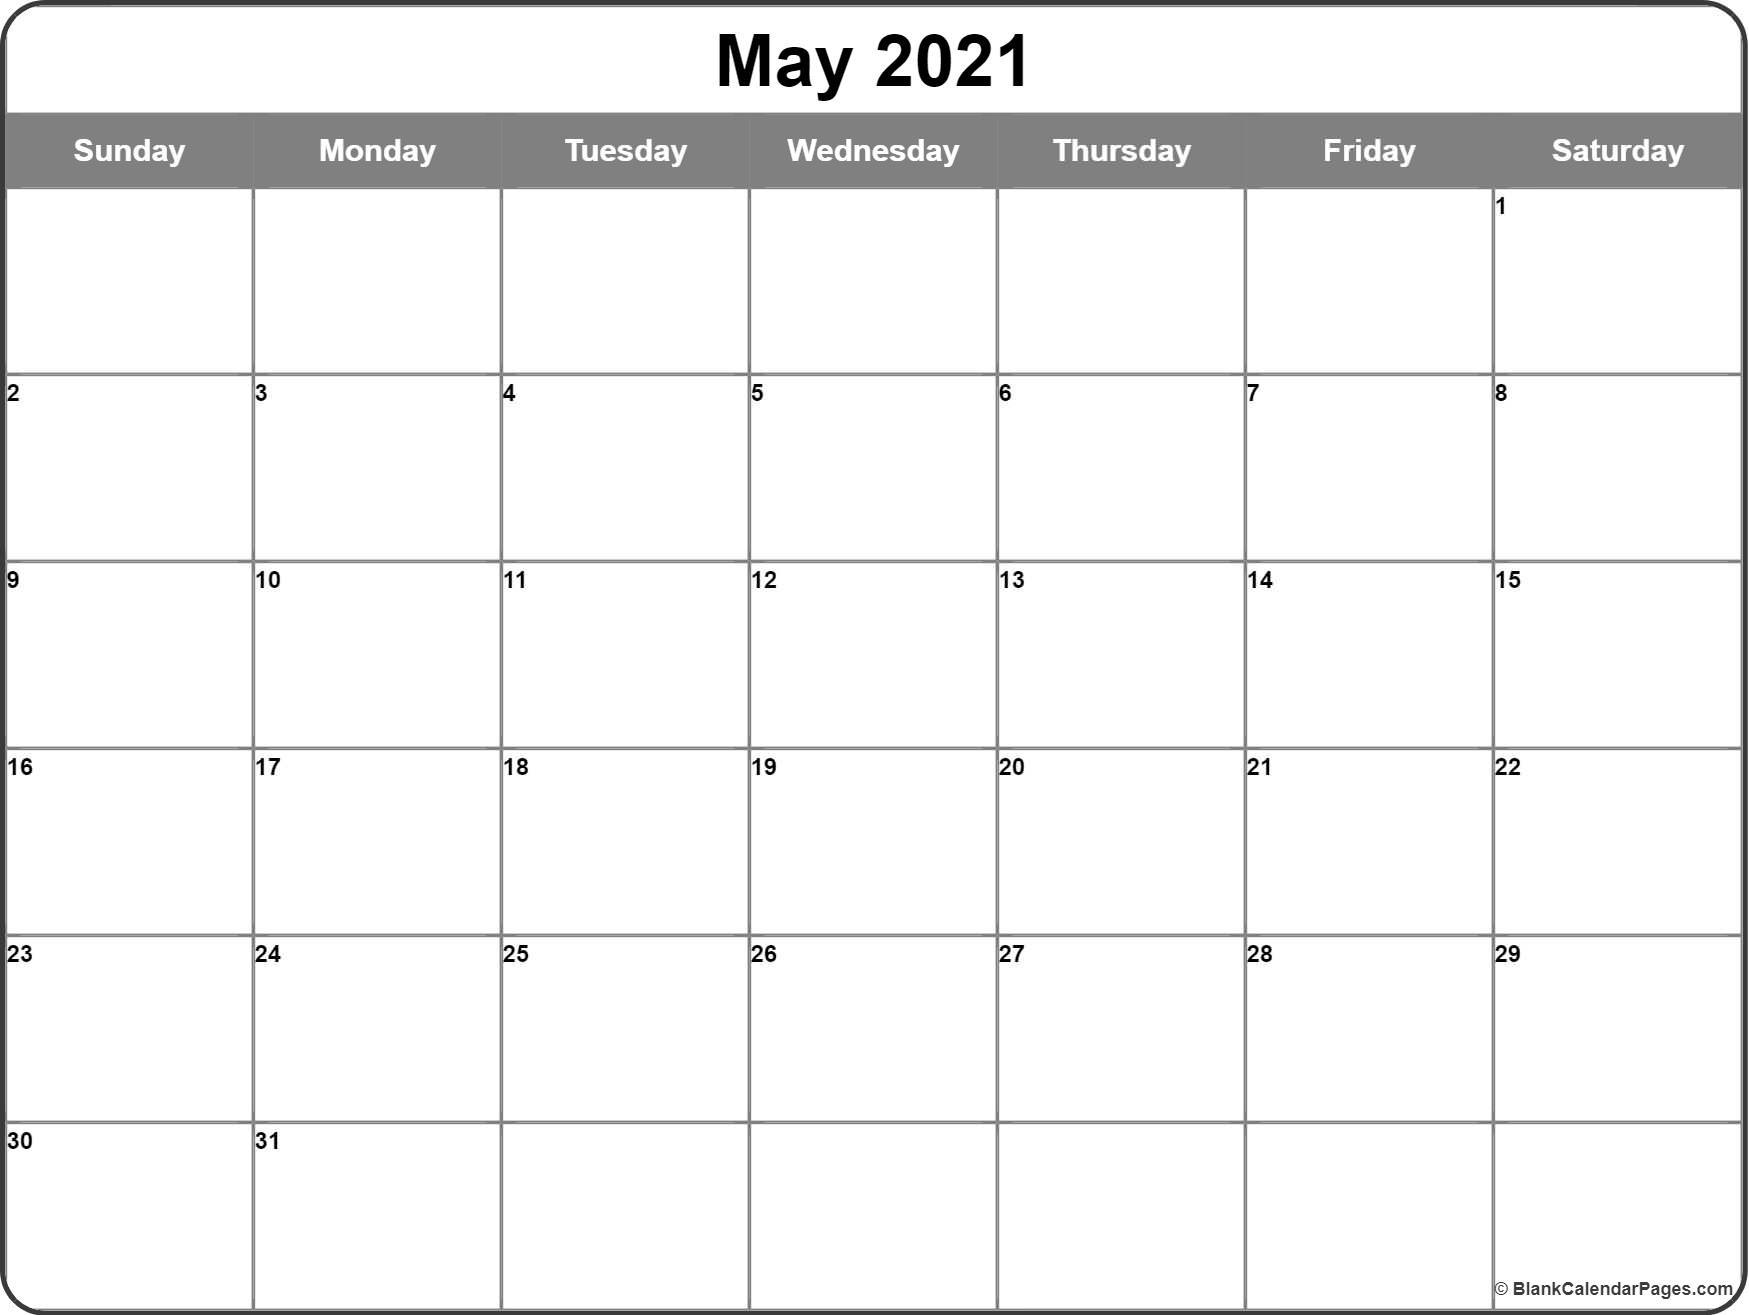 May 2021 Calendar | Free Printable Calendar Blank Calendar July 2020 To June 2021